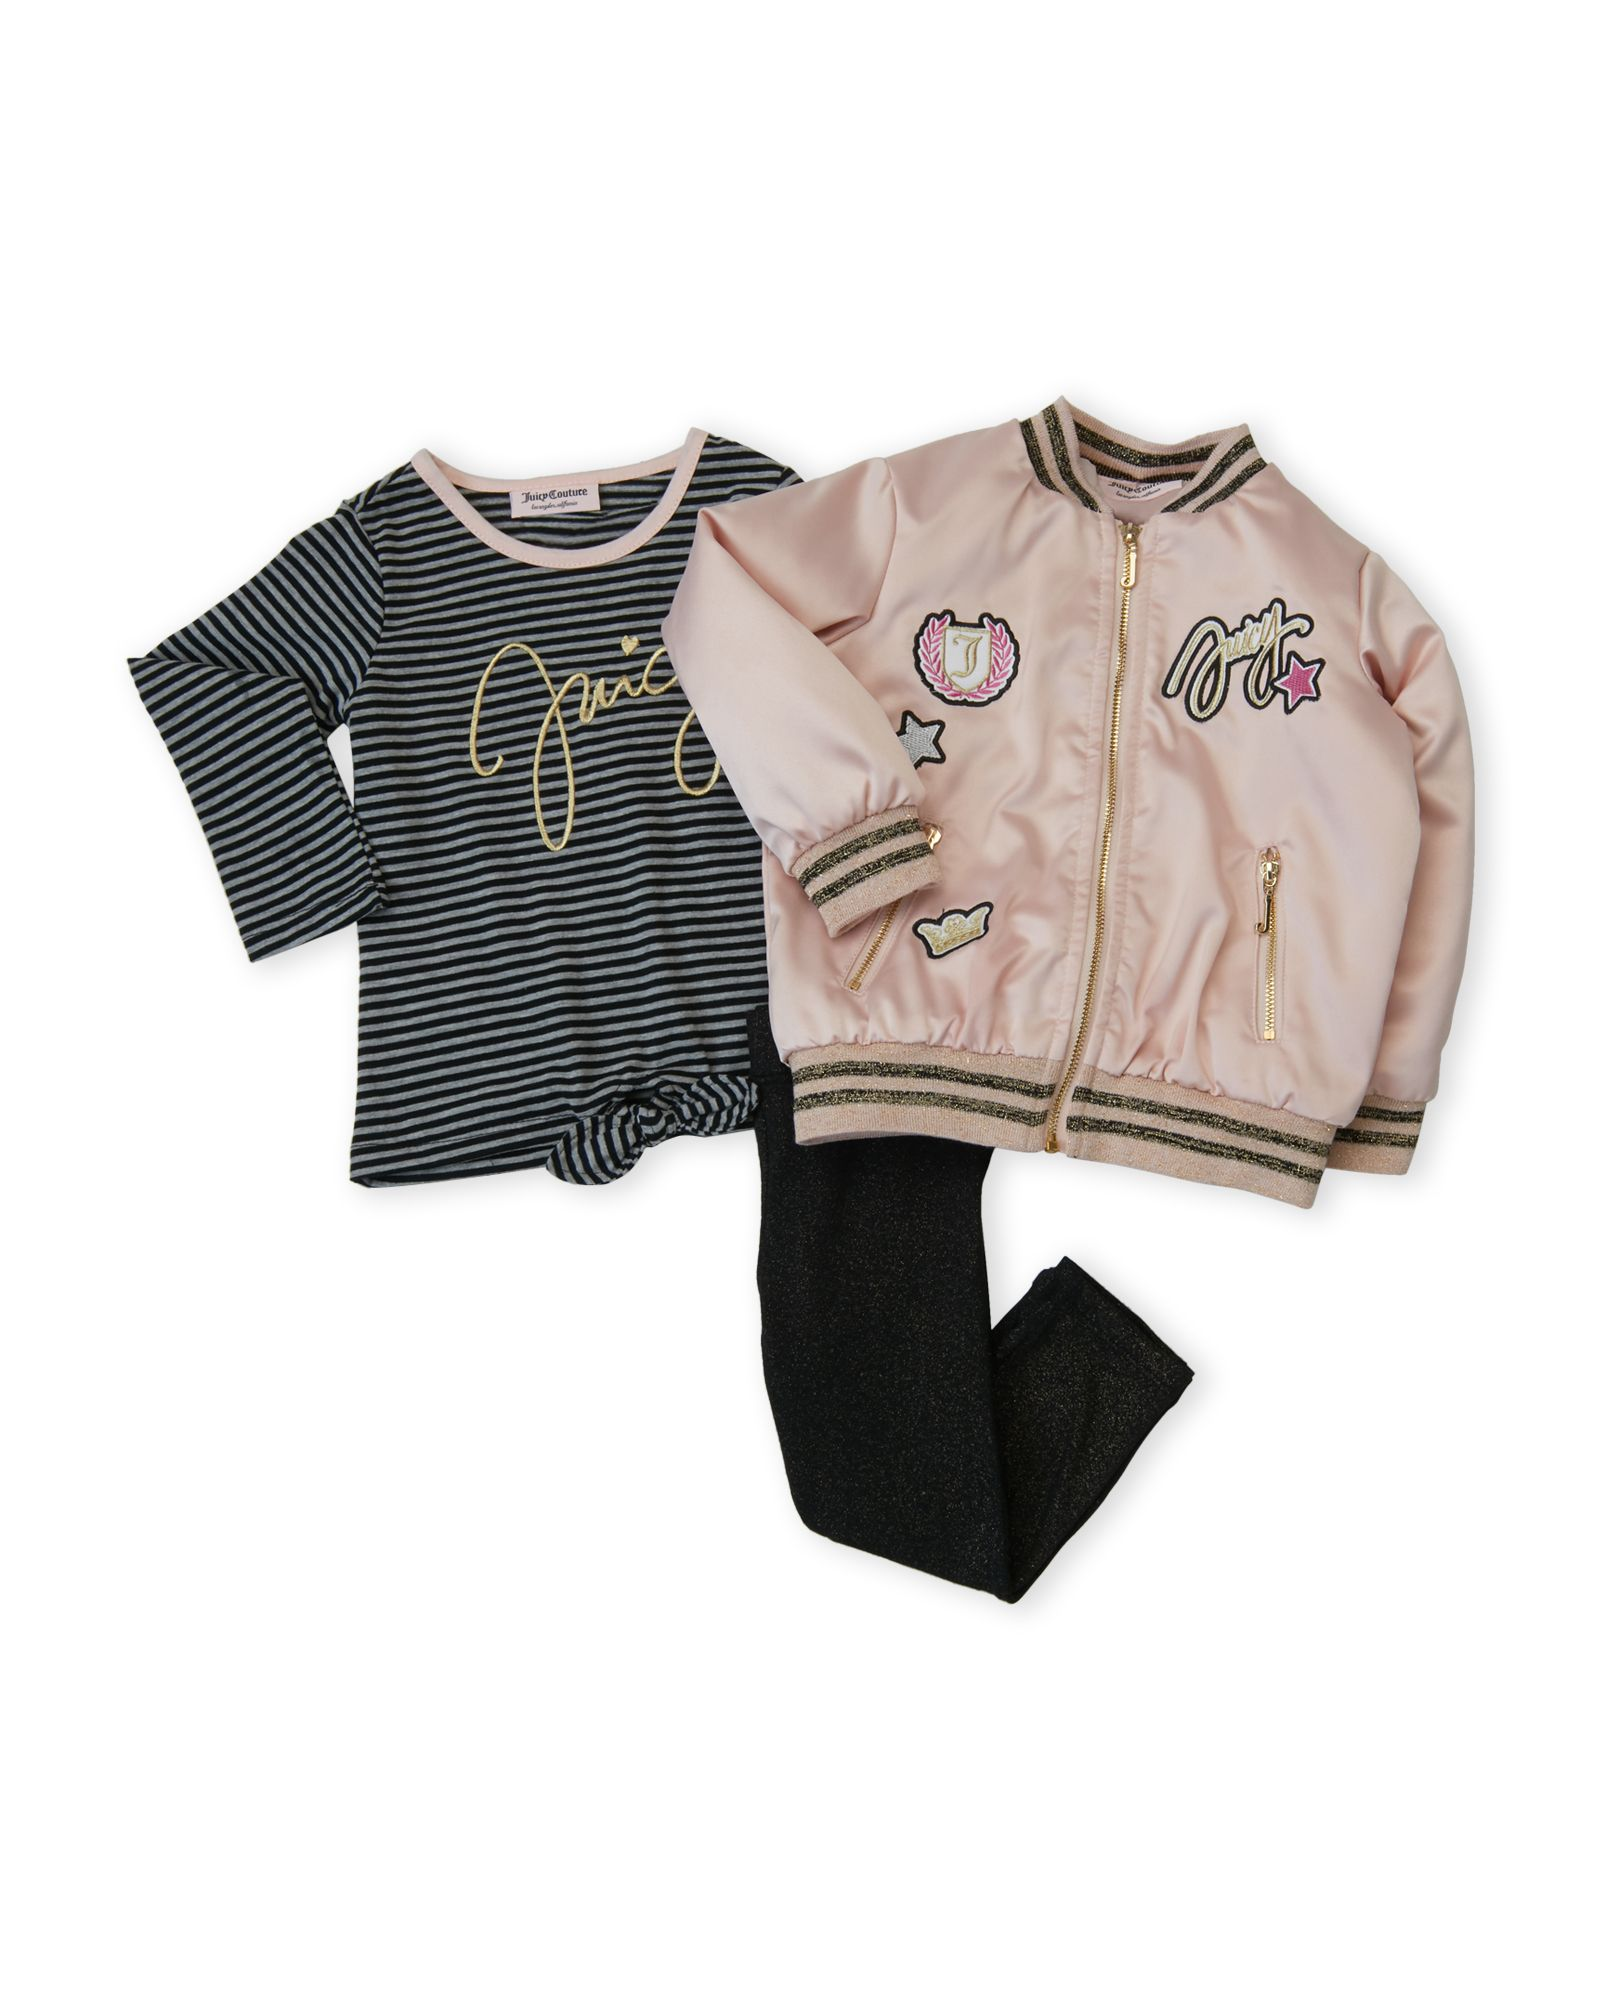 4232a604c Juicy Couture (Toddler Girls) 3-Piece Satin Bomber Jacket & Leggings ...